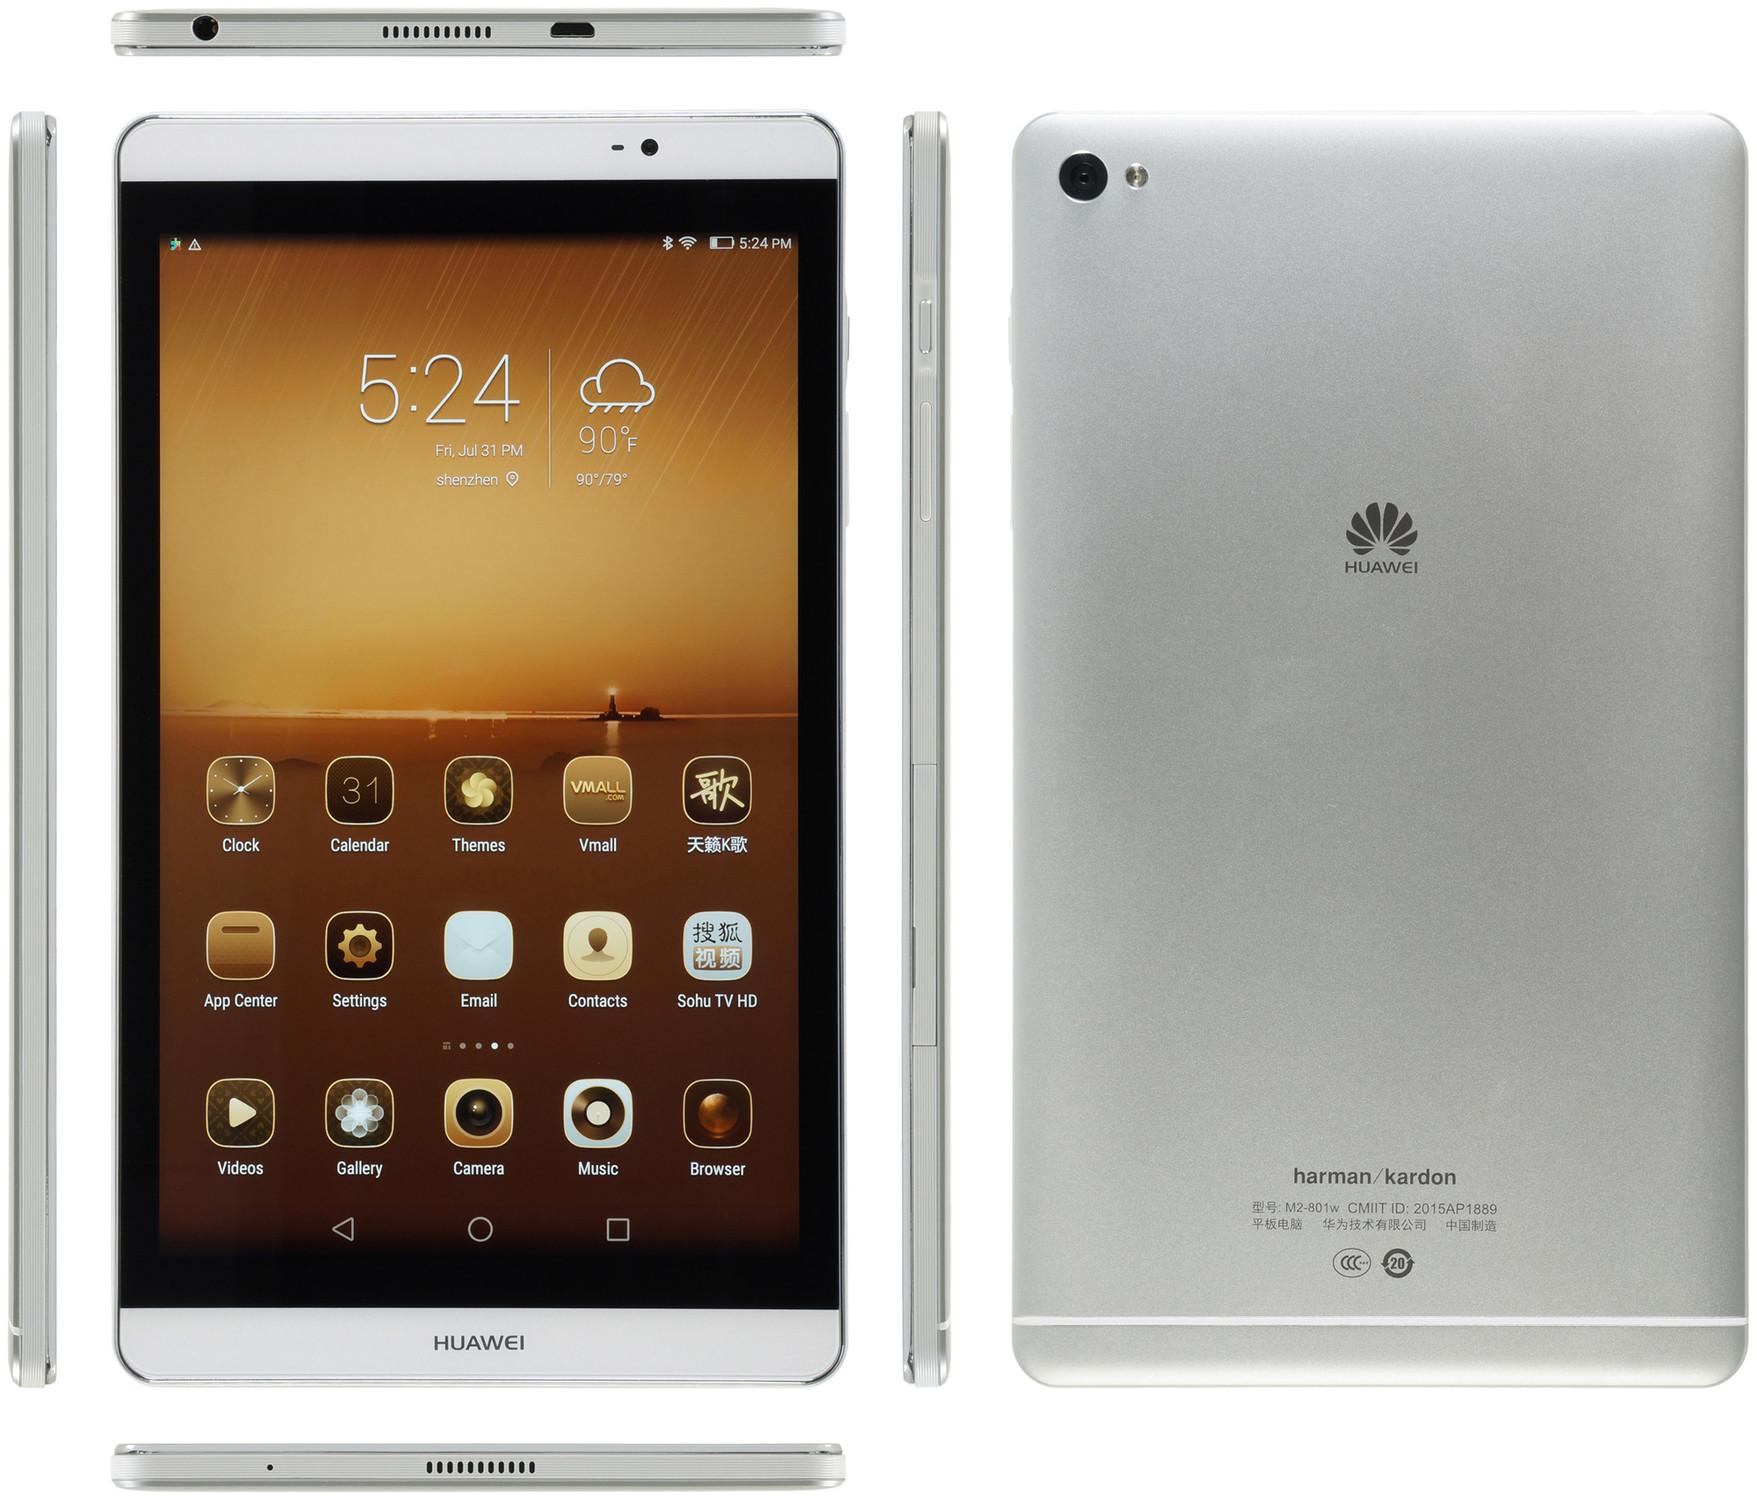 Huawei MediaPad M2-802L 4G 32GB - Specs and Price